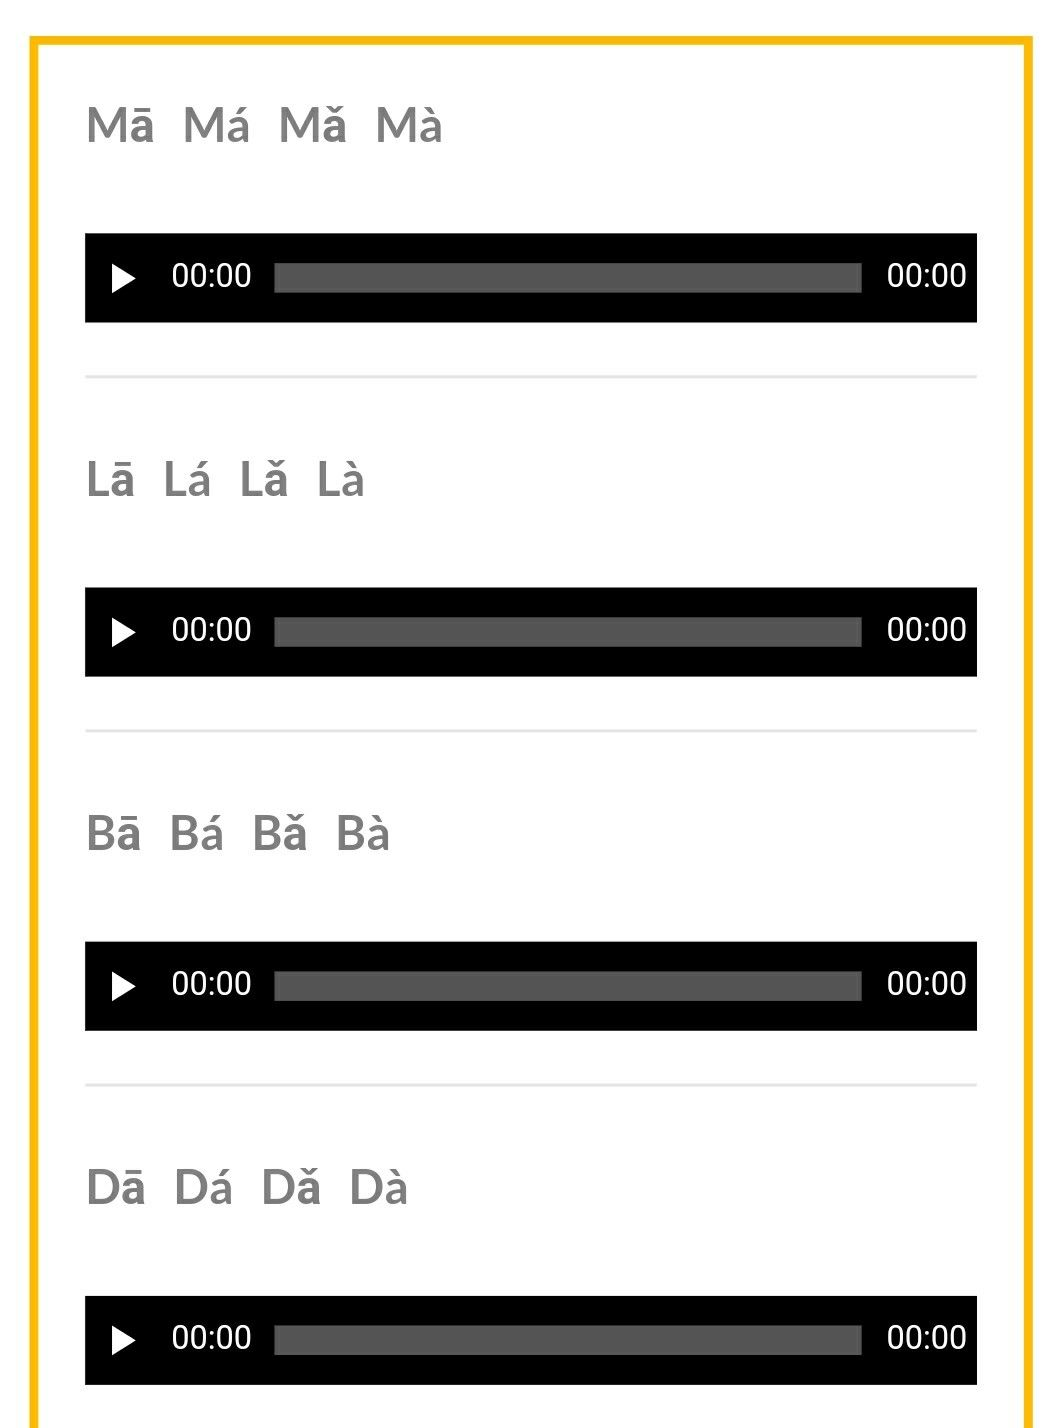 Chinese Tones Practice Pinyin Pronunciation Audio 4 Tones